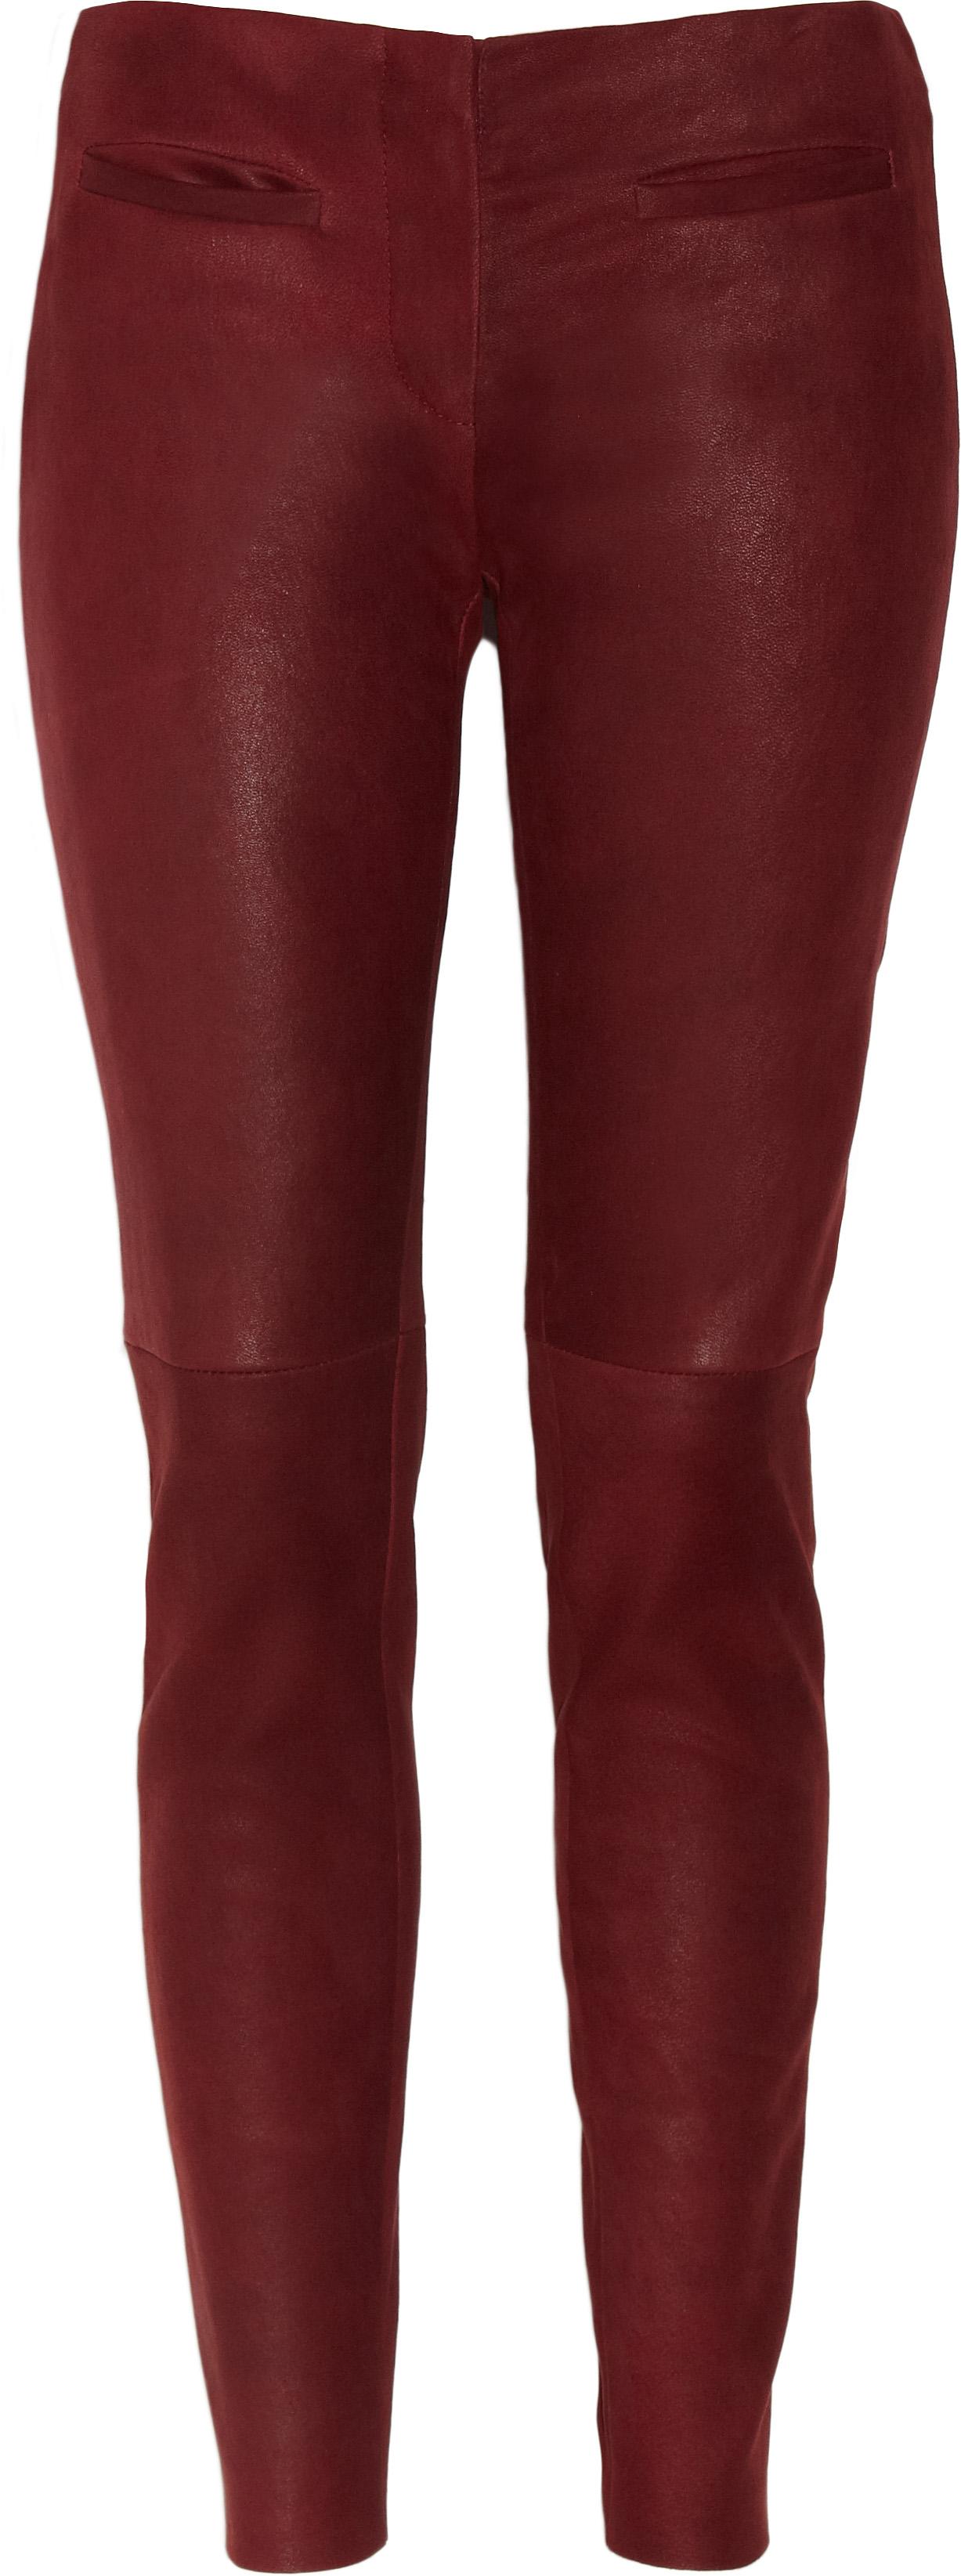 Red Leather Look Leggings